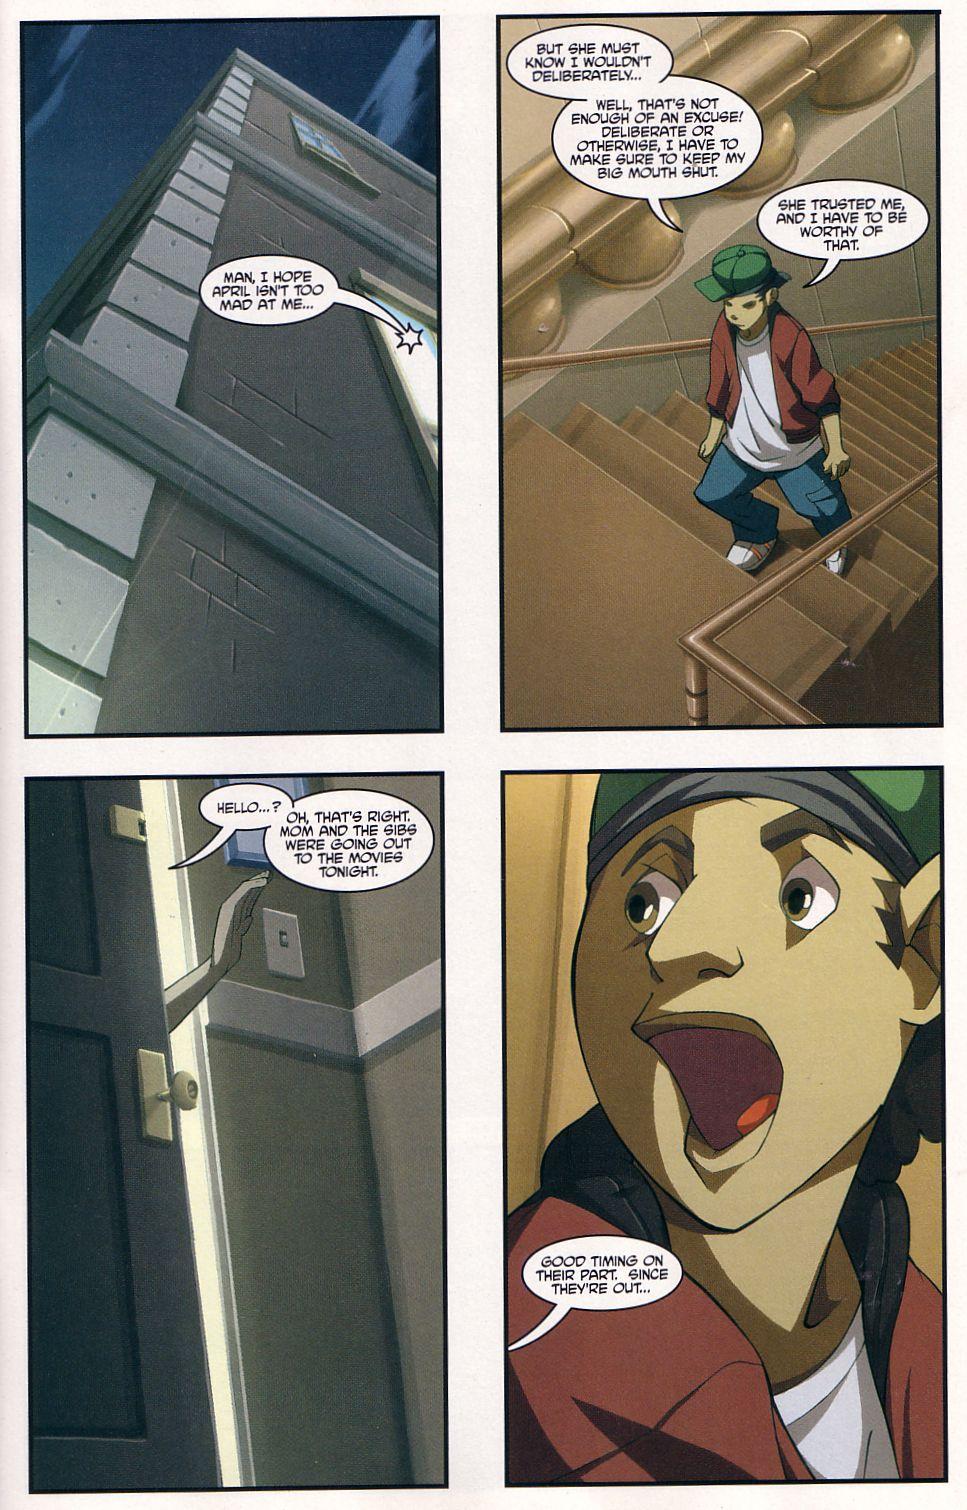 Teenage Mutant Ninja Turtles (2003) chap 7 pic 11